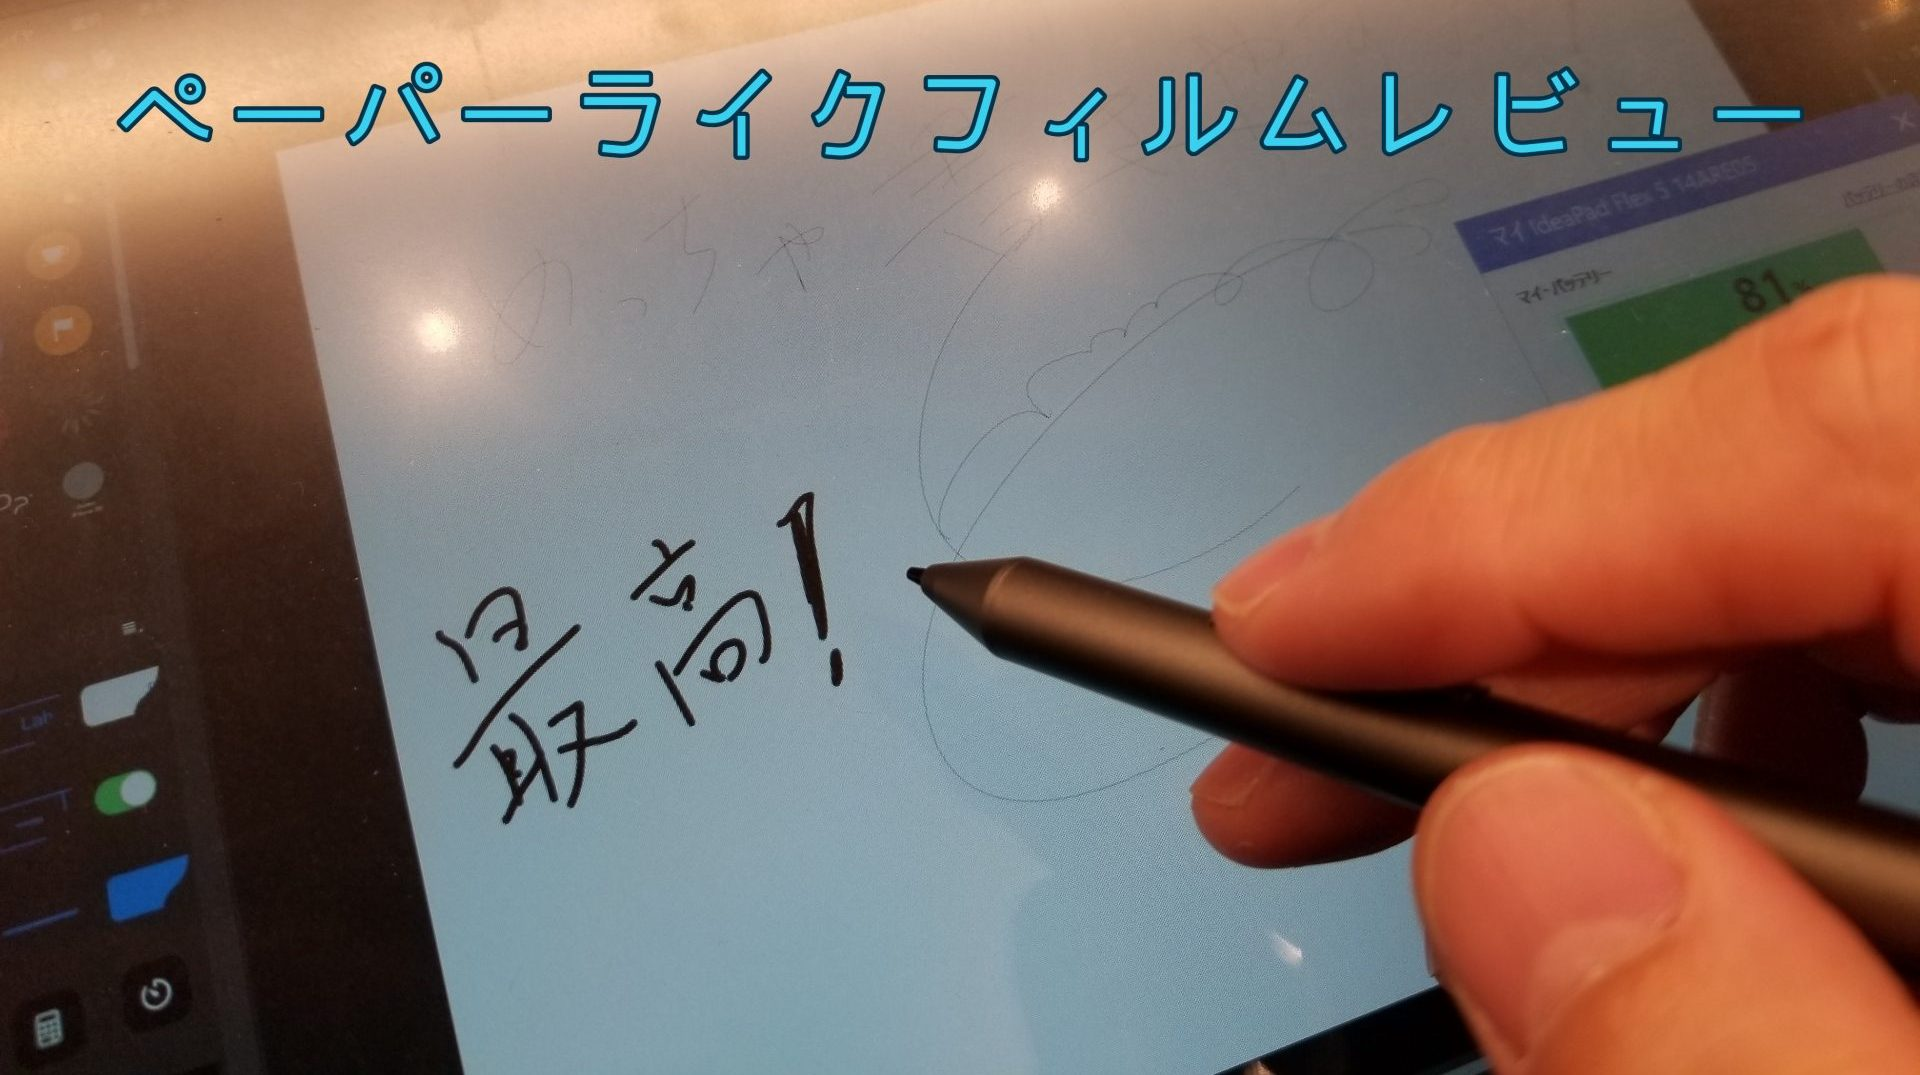 PDA工房 Lenovo IdeaPad Flex 550/550i (14) ペーパーライク 保護 フィルム 反射低減 日本製のアイキャッチ画像